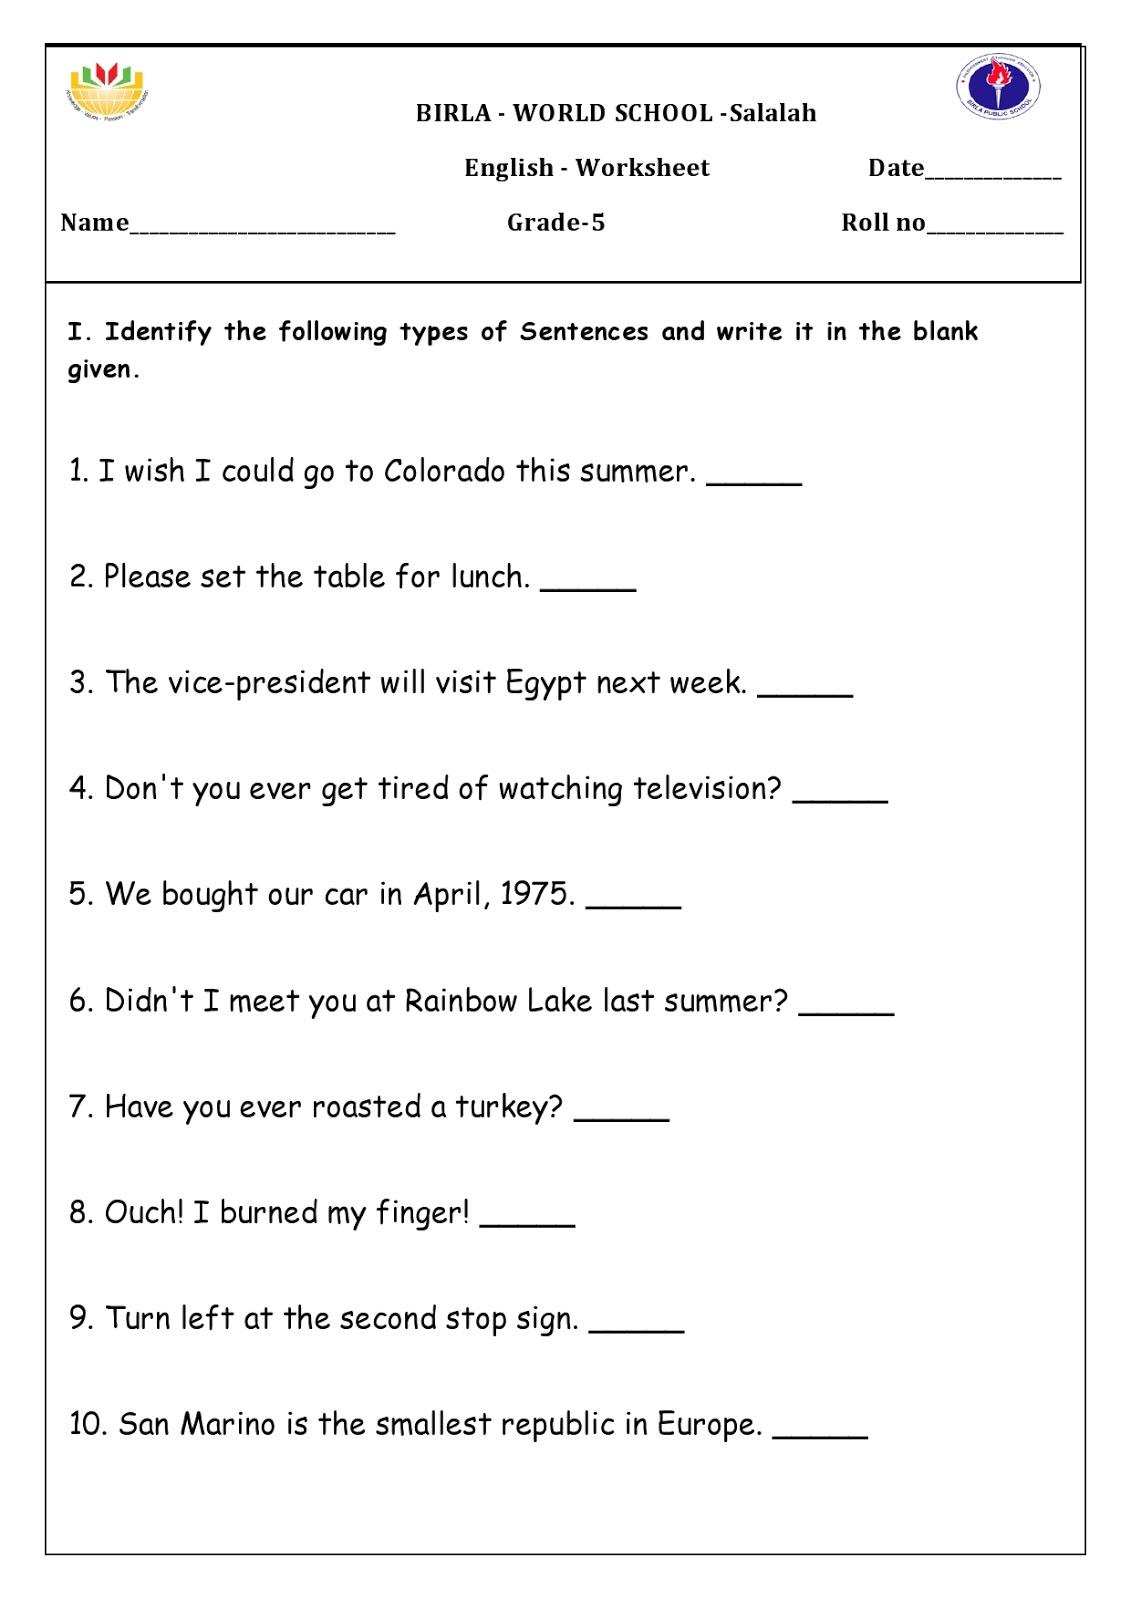 Birla World School Oman Homework For Grade 5b On 19 05 16